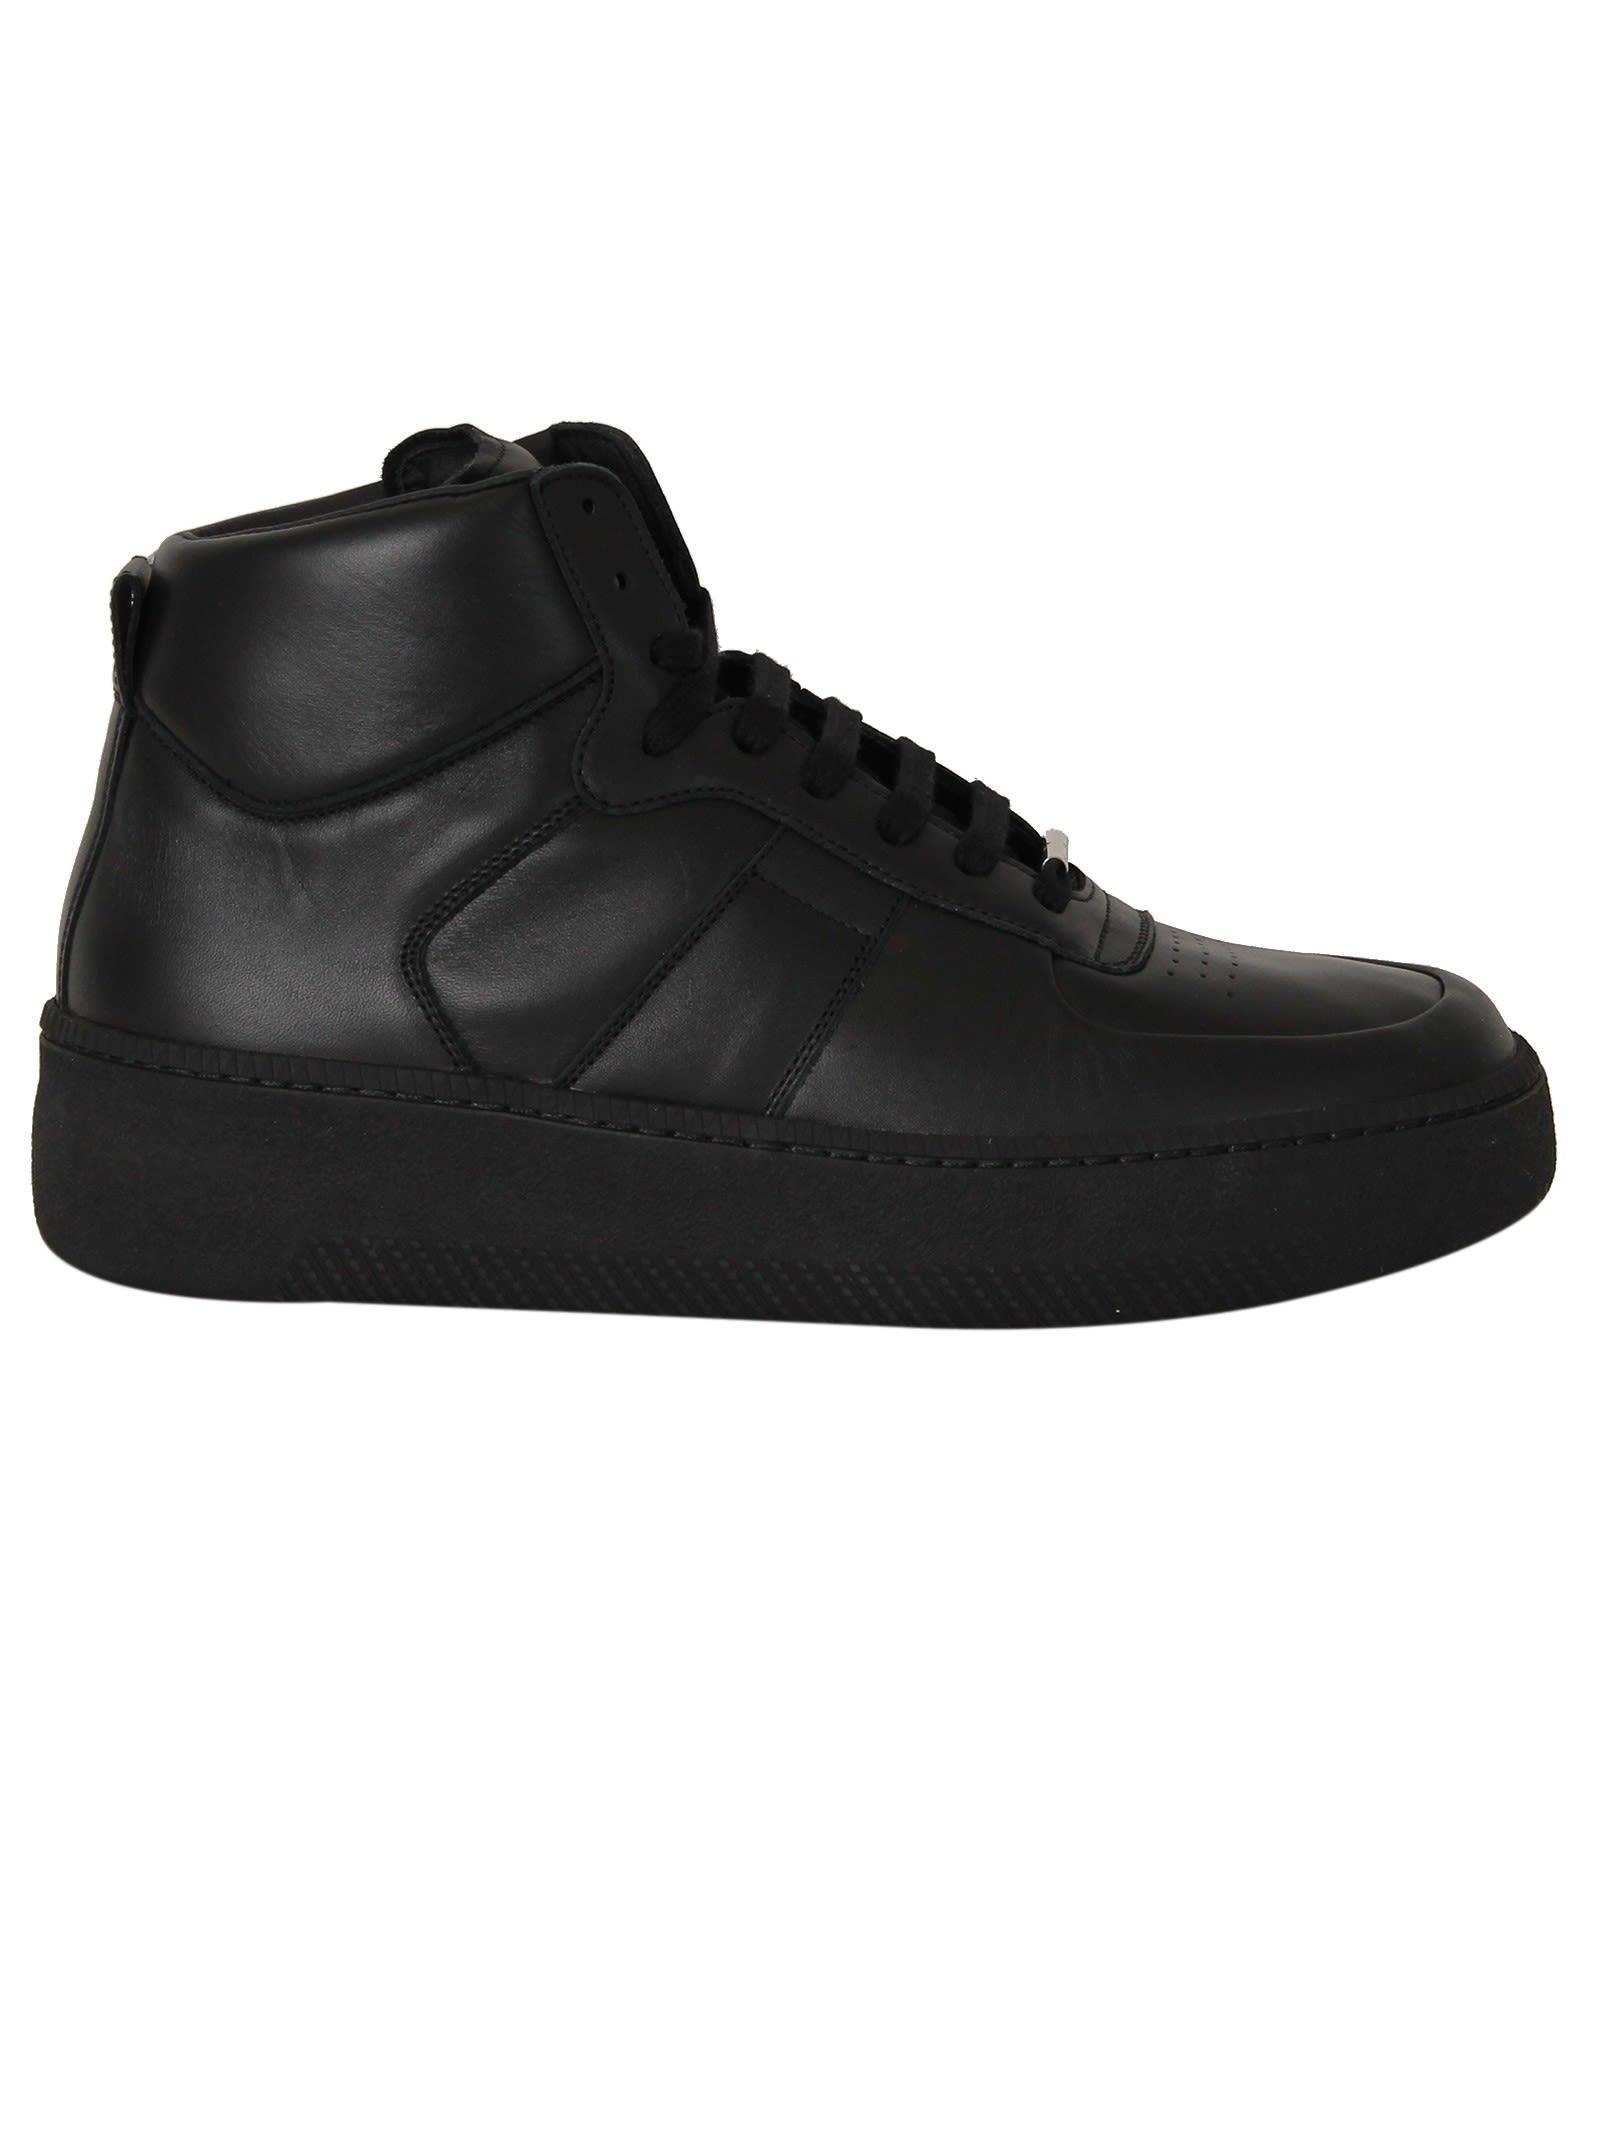 Maison Margiela Black Calf Hi-top Sneakers